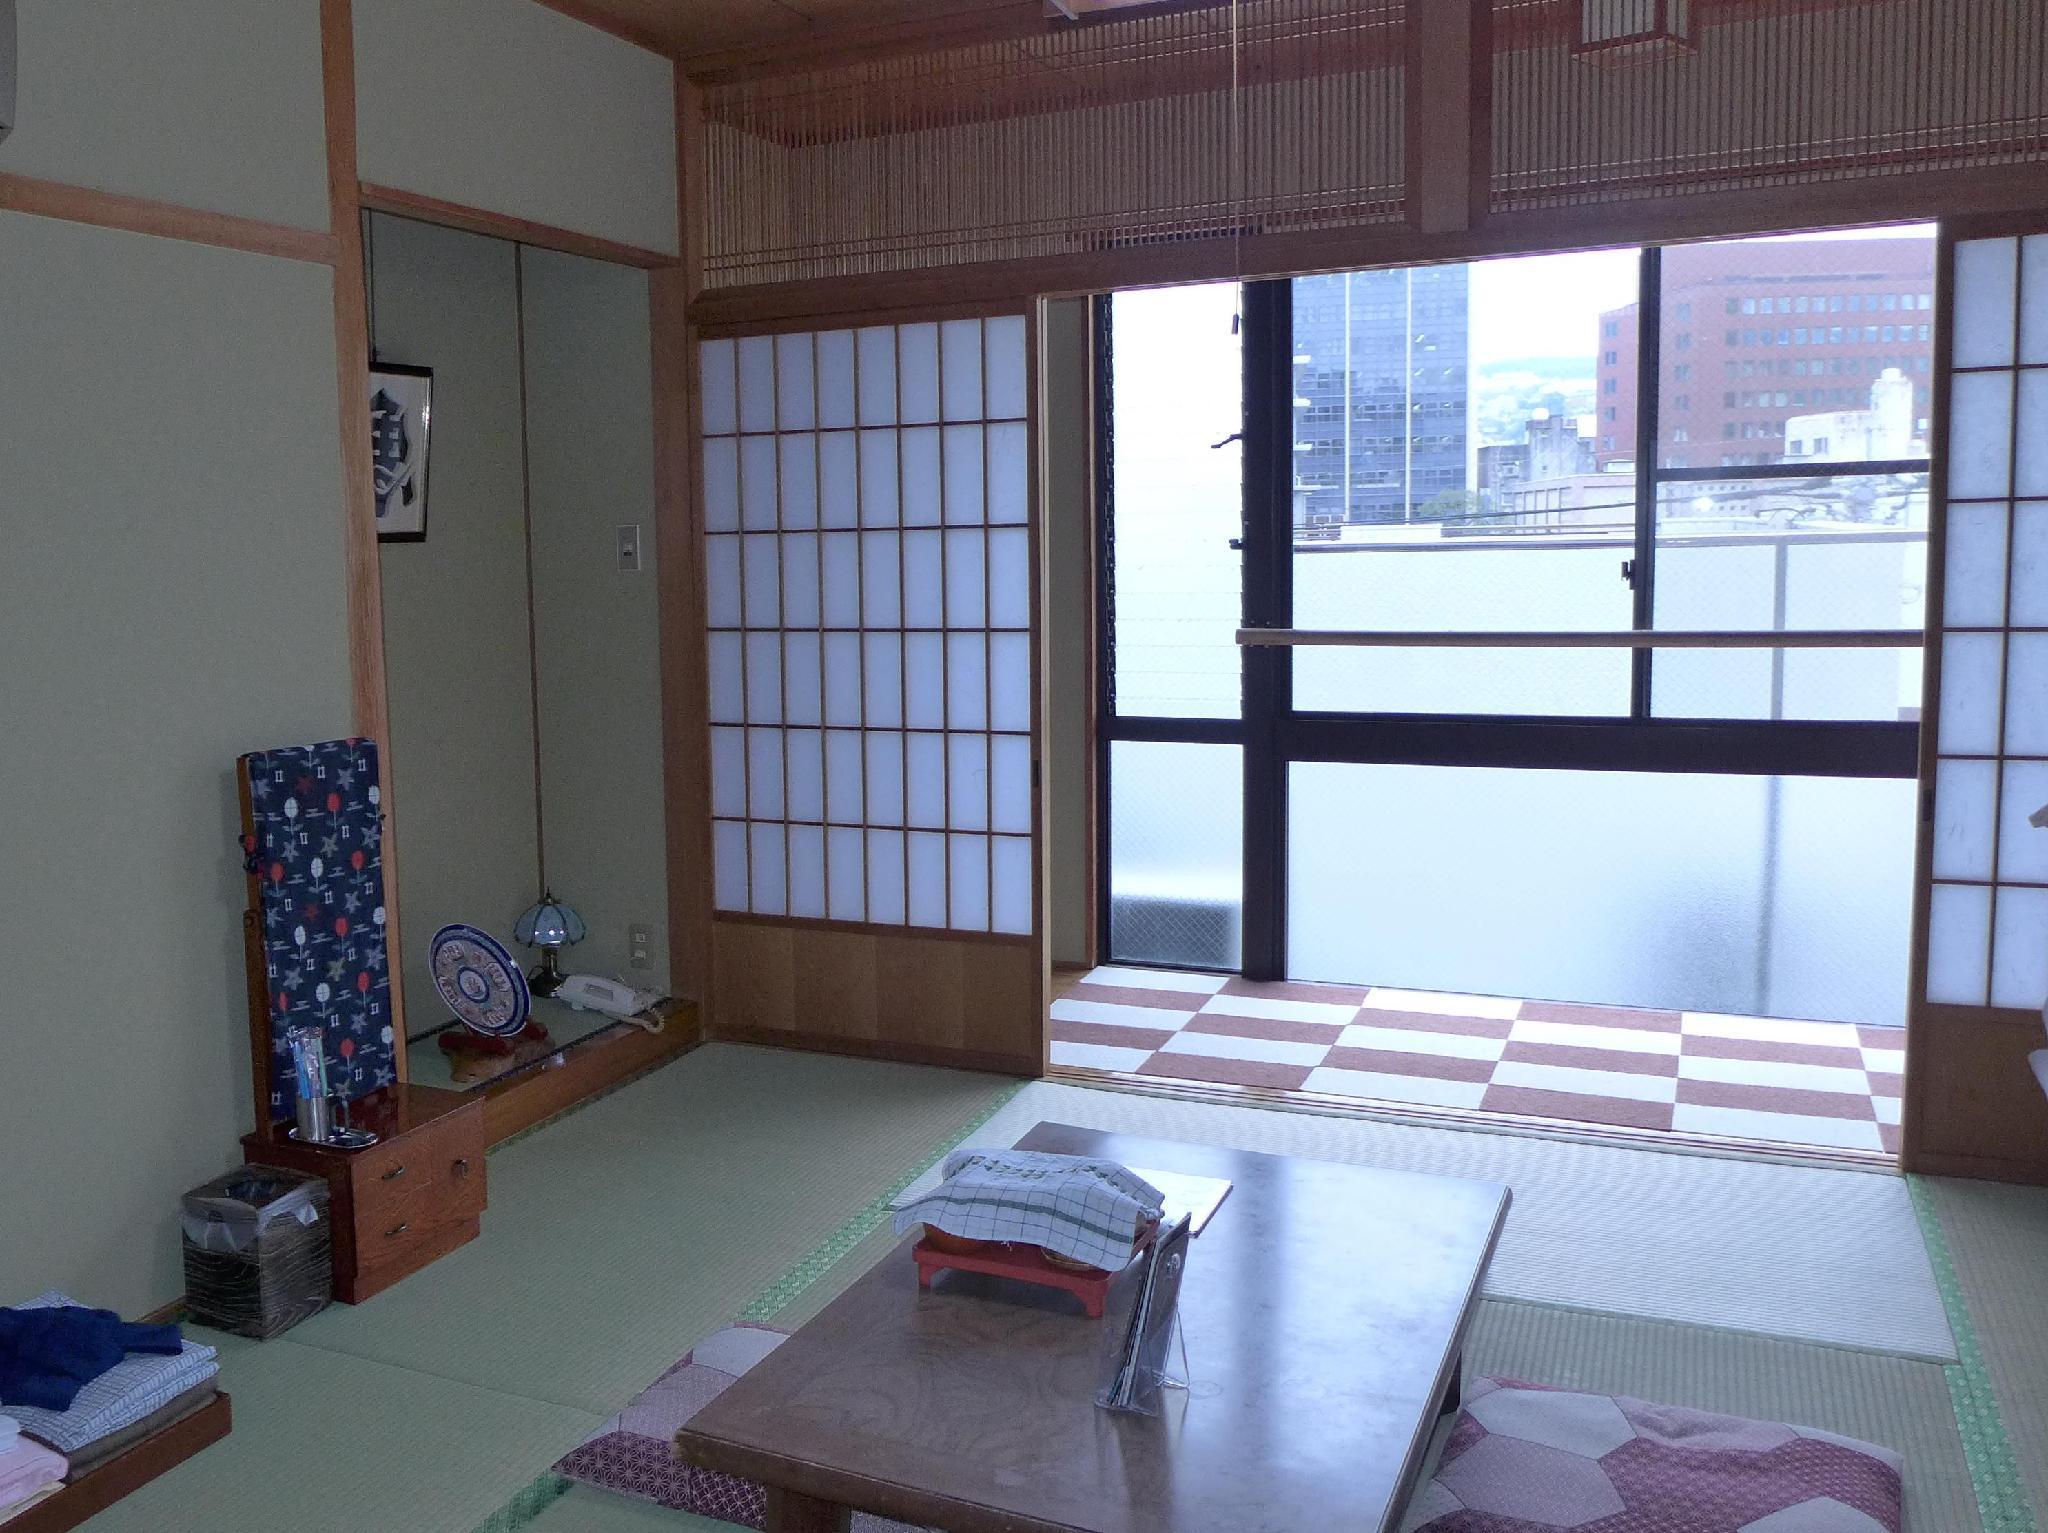 Fujiwara Ryokan Hotel in Nagasaki - Room Deals, Photos & Reviews